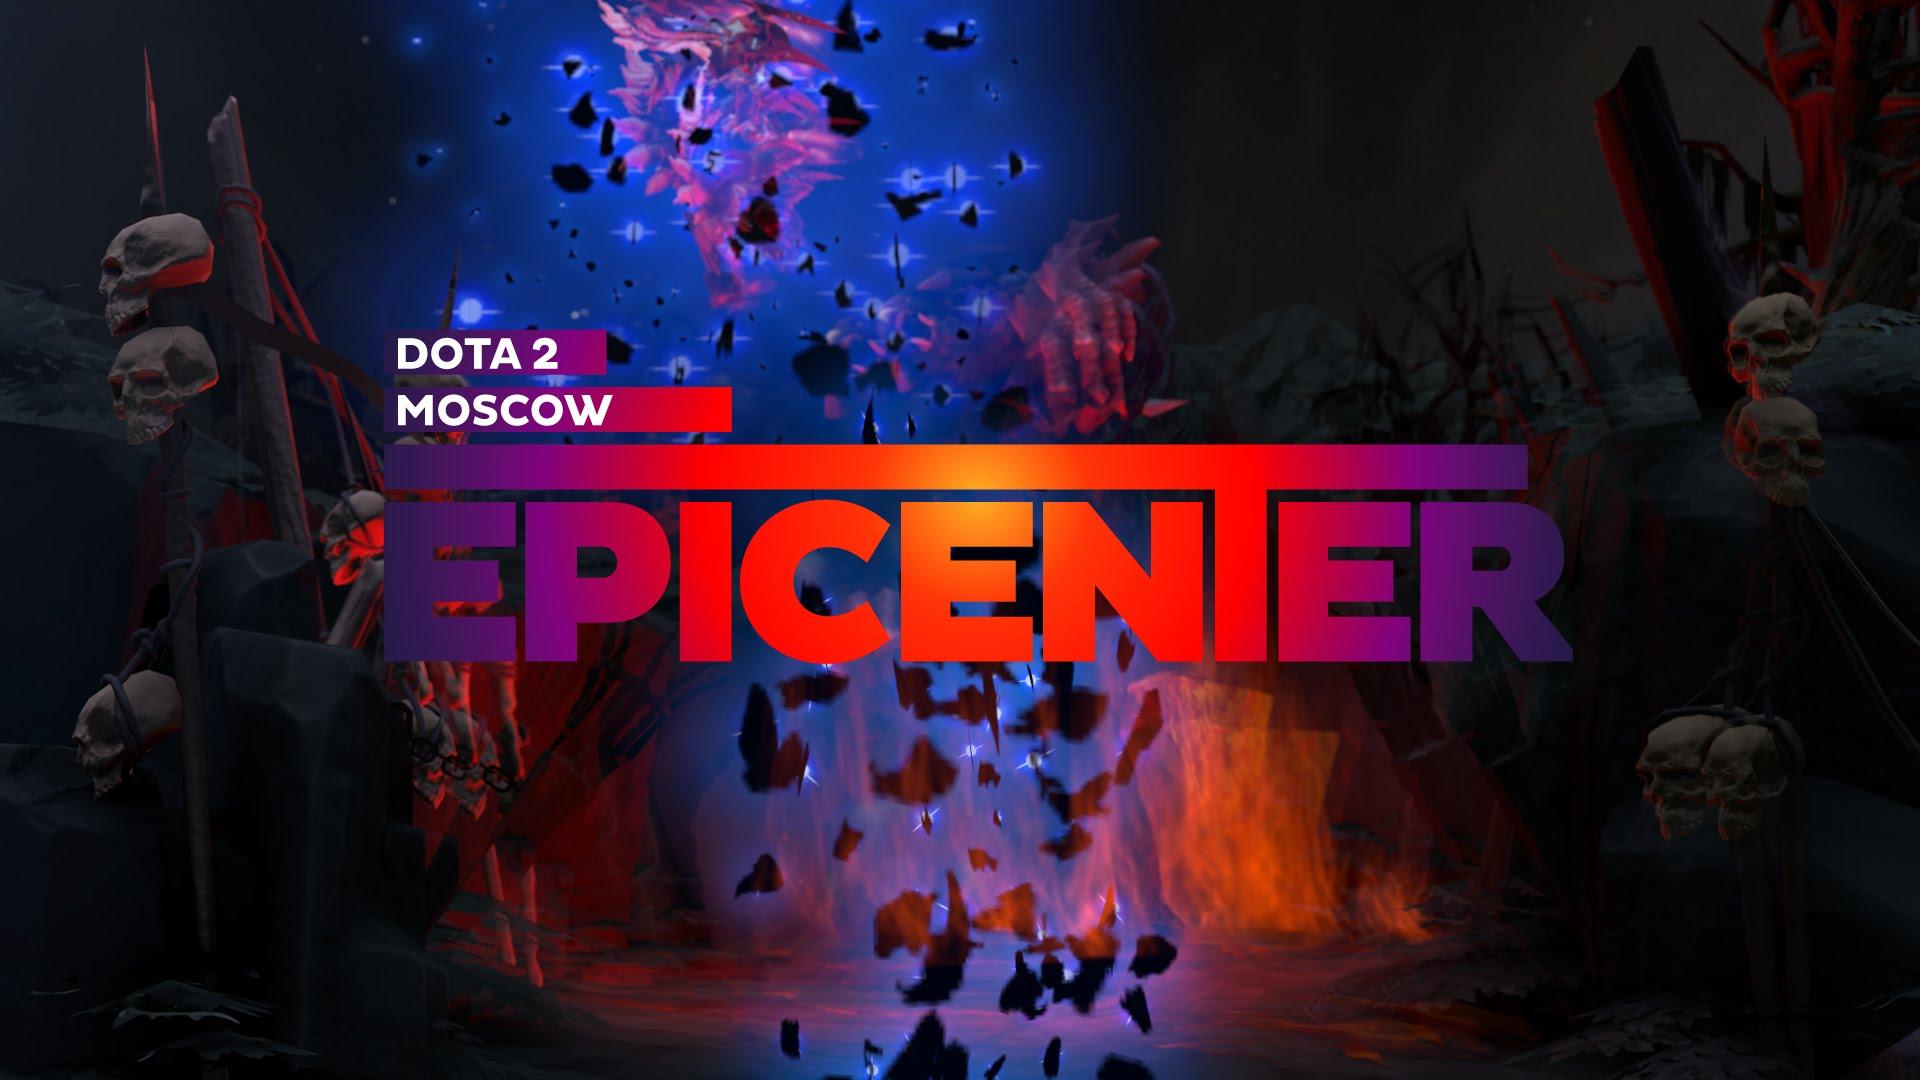 Dota 2 Epicenter: Moscow 2017. Финал